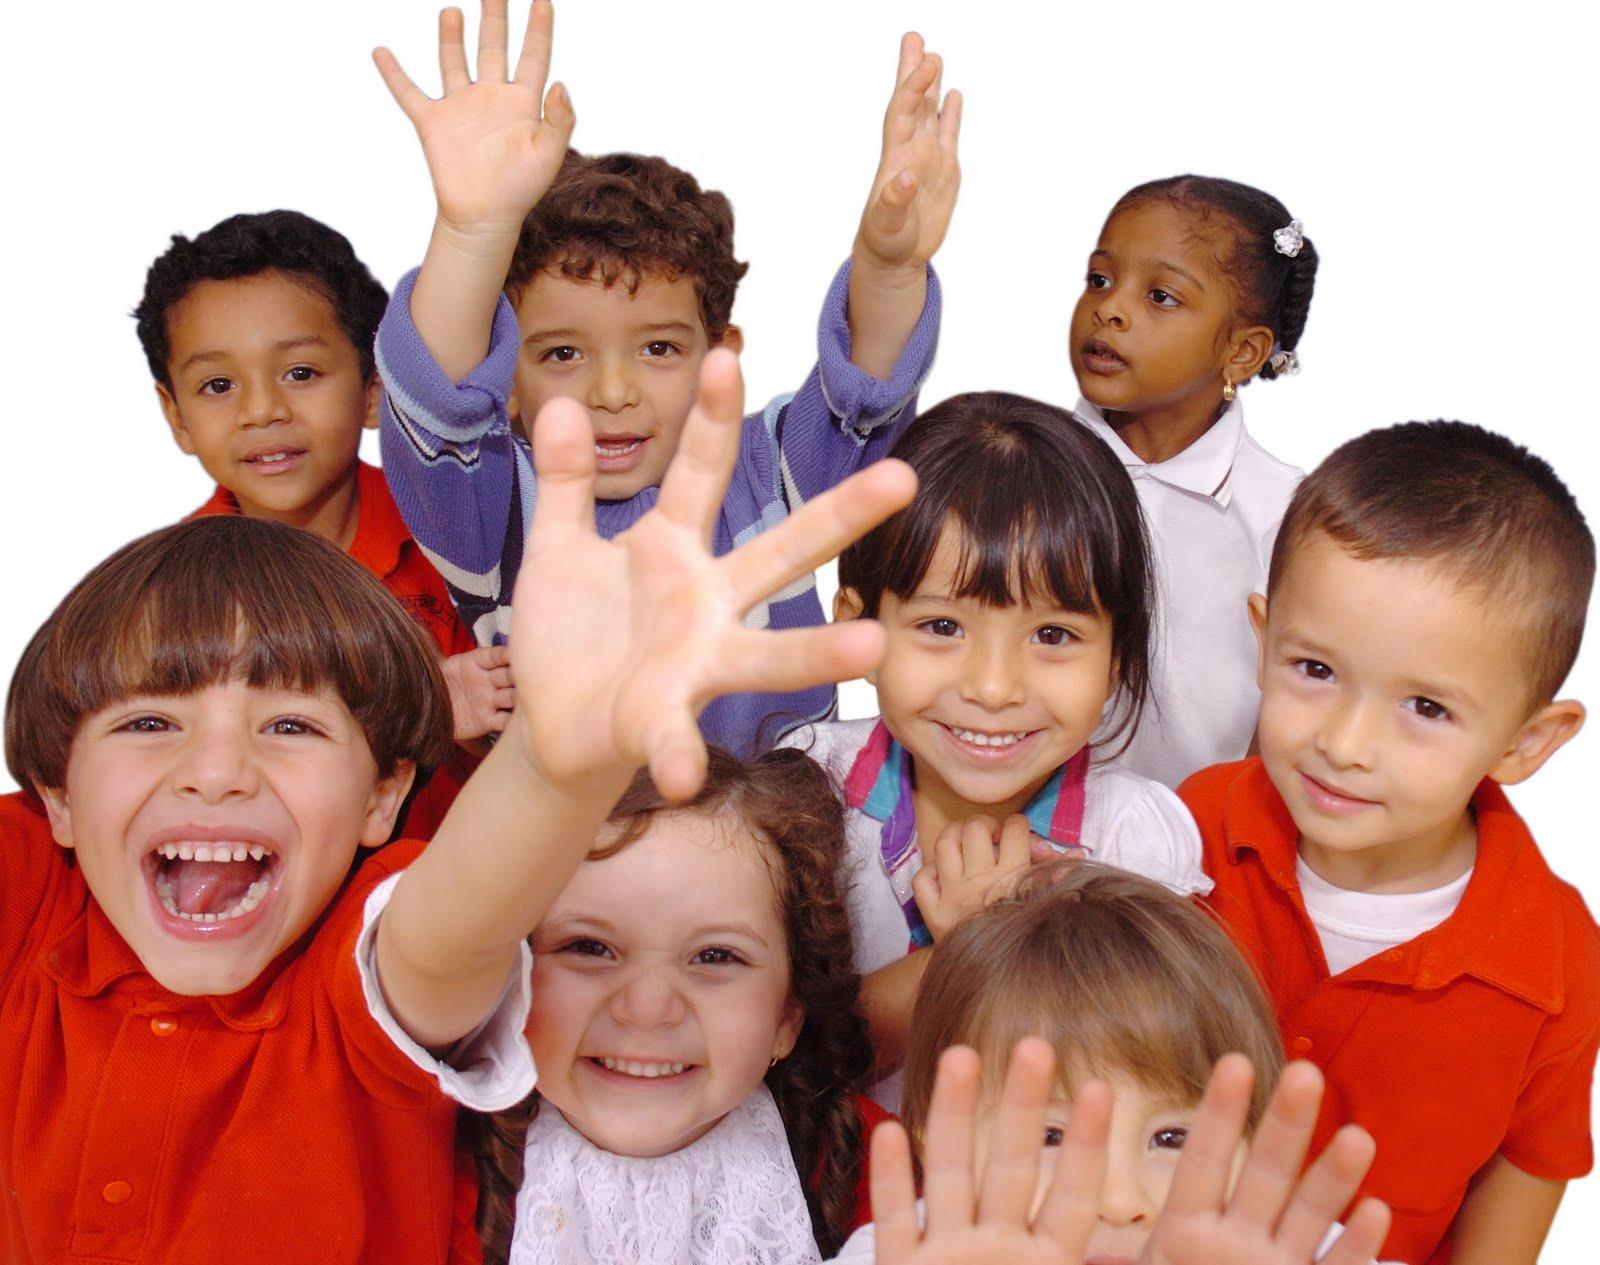 Scholarships for children under age 13